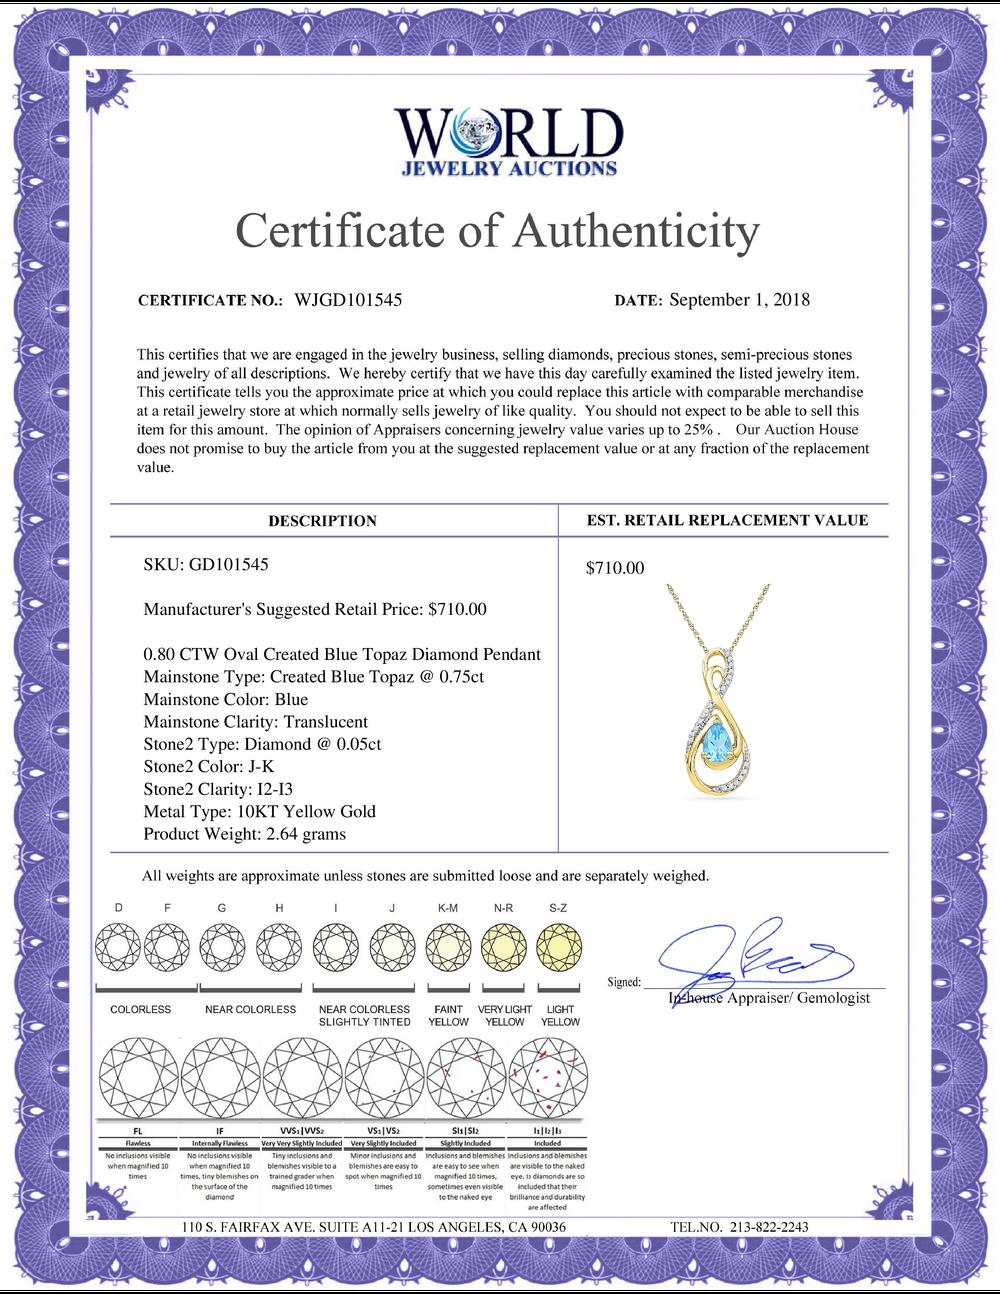 Lot 3044: 0.80 CTW Oval Created Blue Topaz Solitaire Diamond Teardrop Pendant 10KT Yellow Gold - REF-18M2H